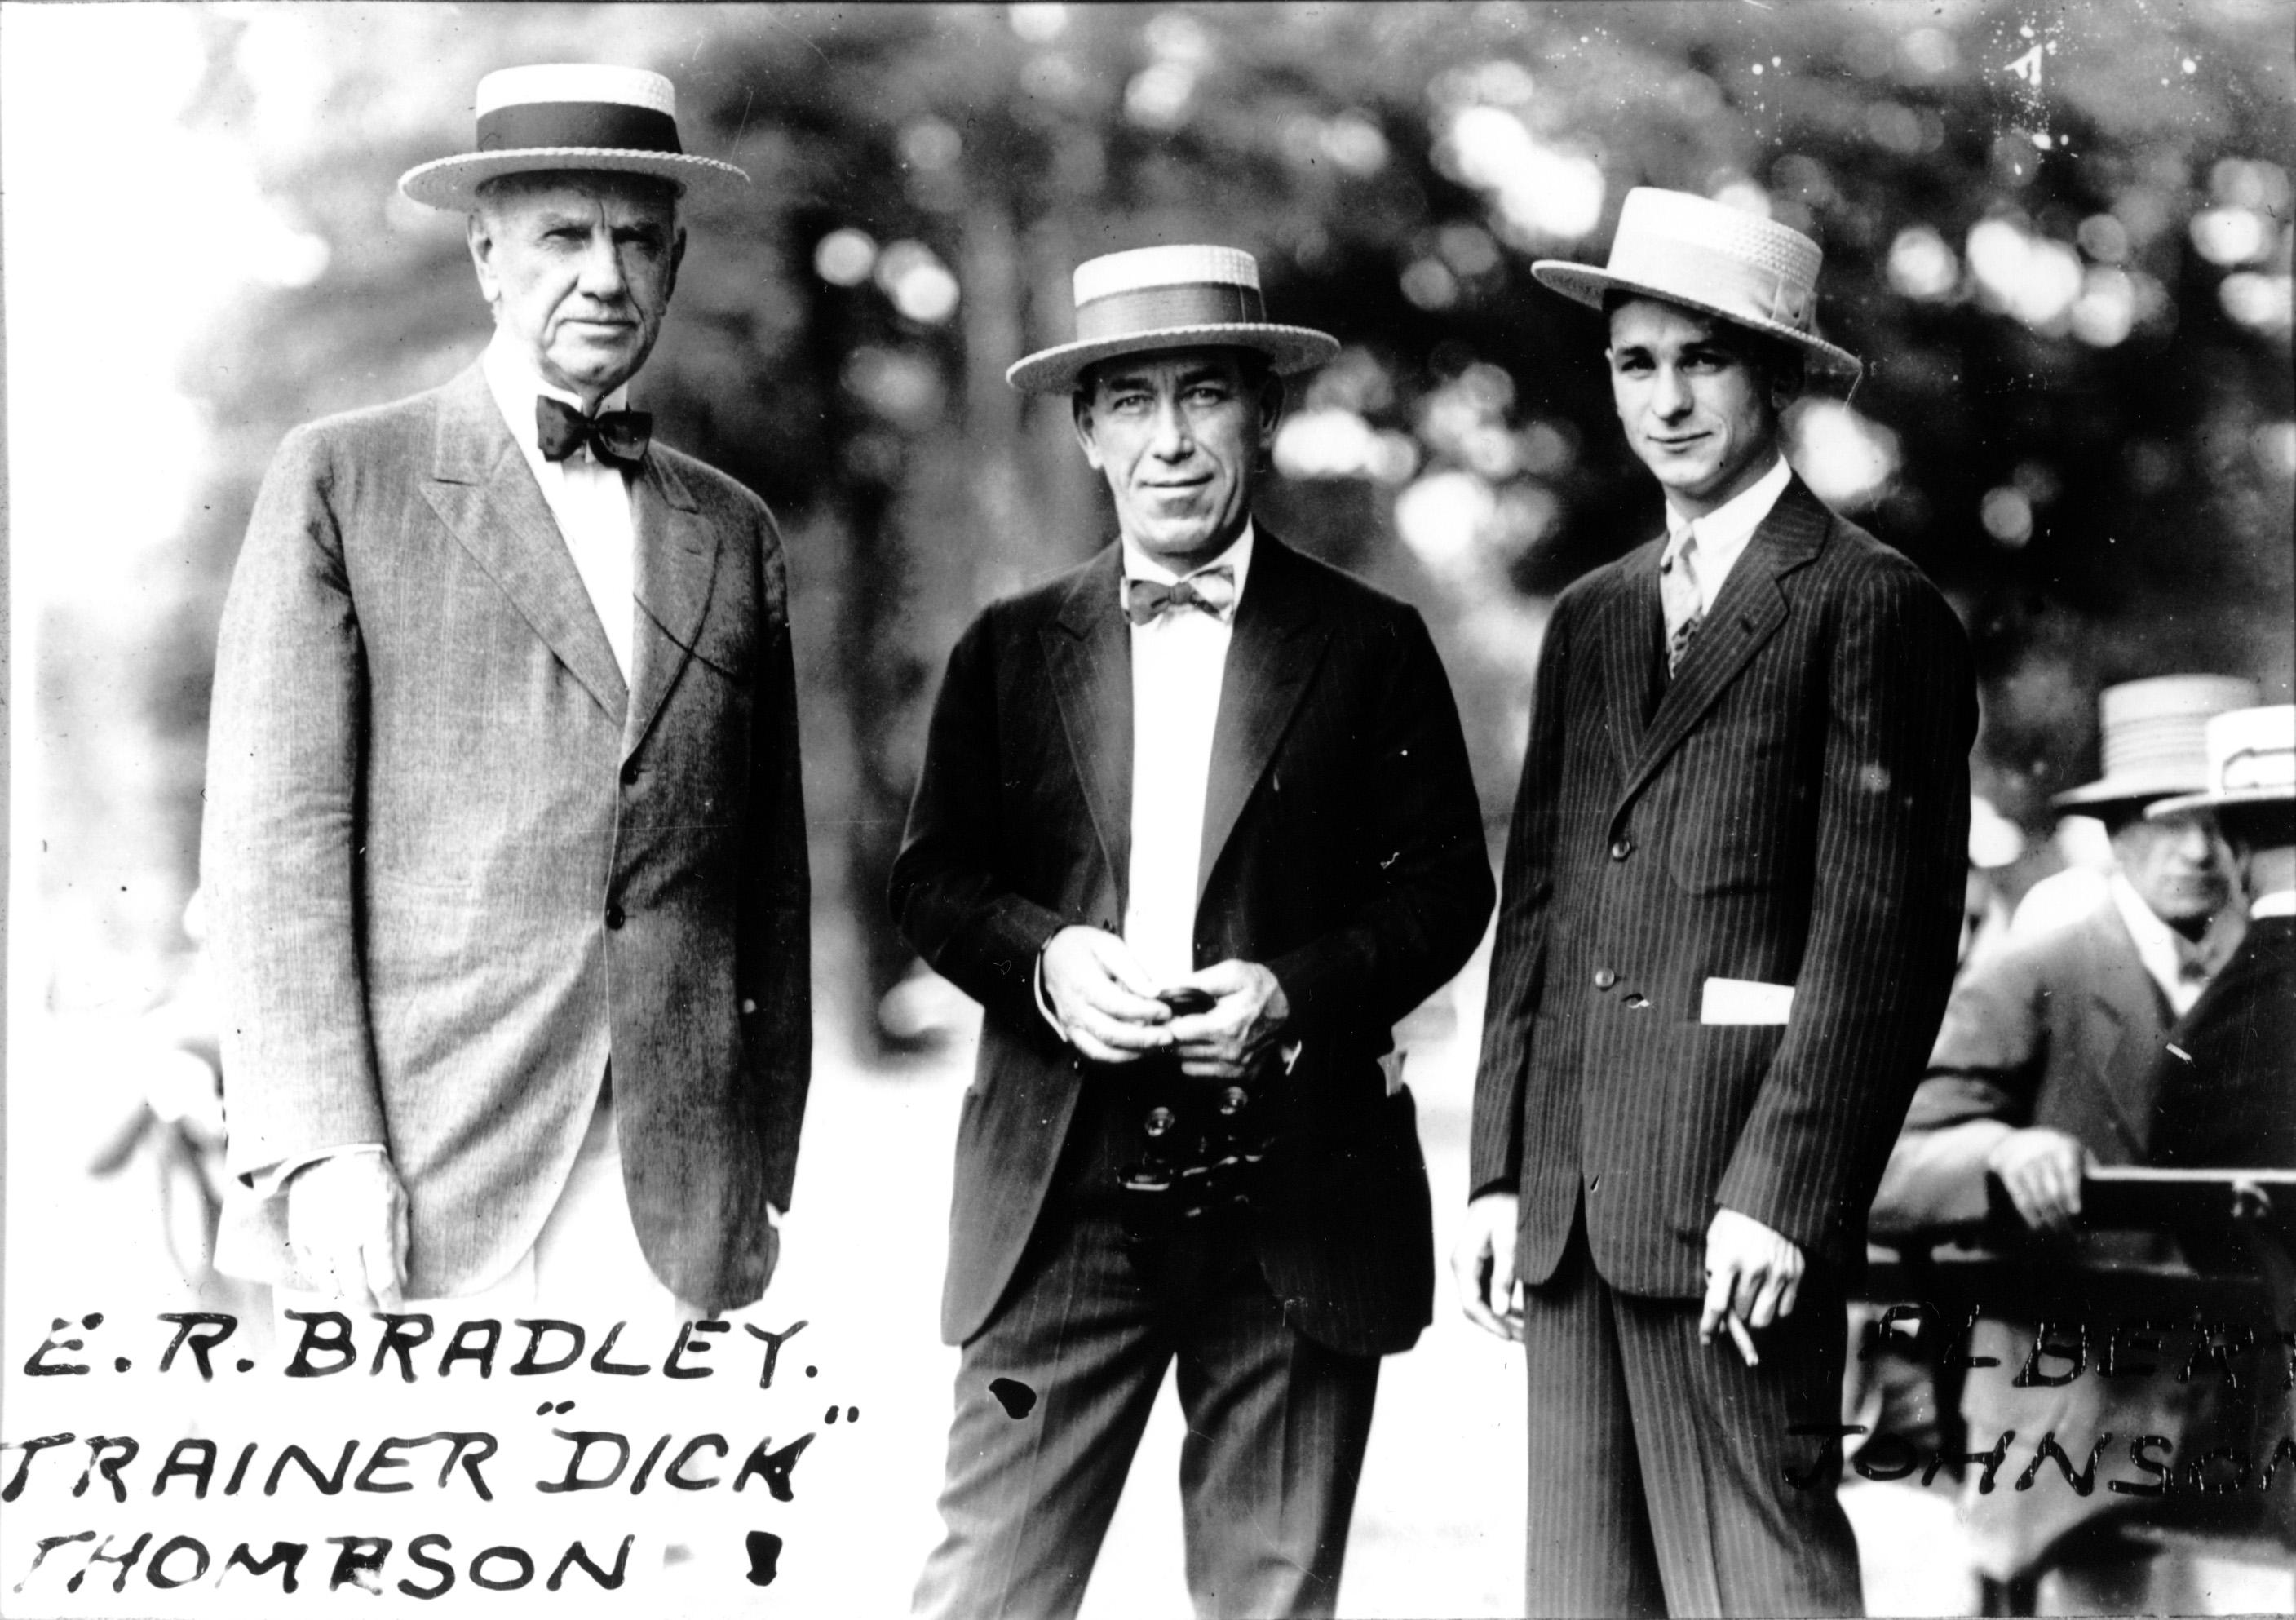 Col. E. R. Bradley, trainer Dick Thompson, and jockey Albert Johnson (C. C. Cook/Museum Collection)